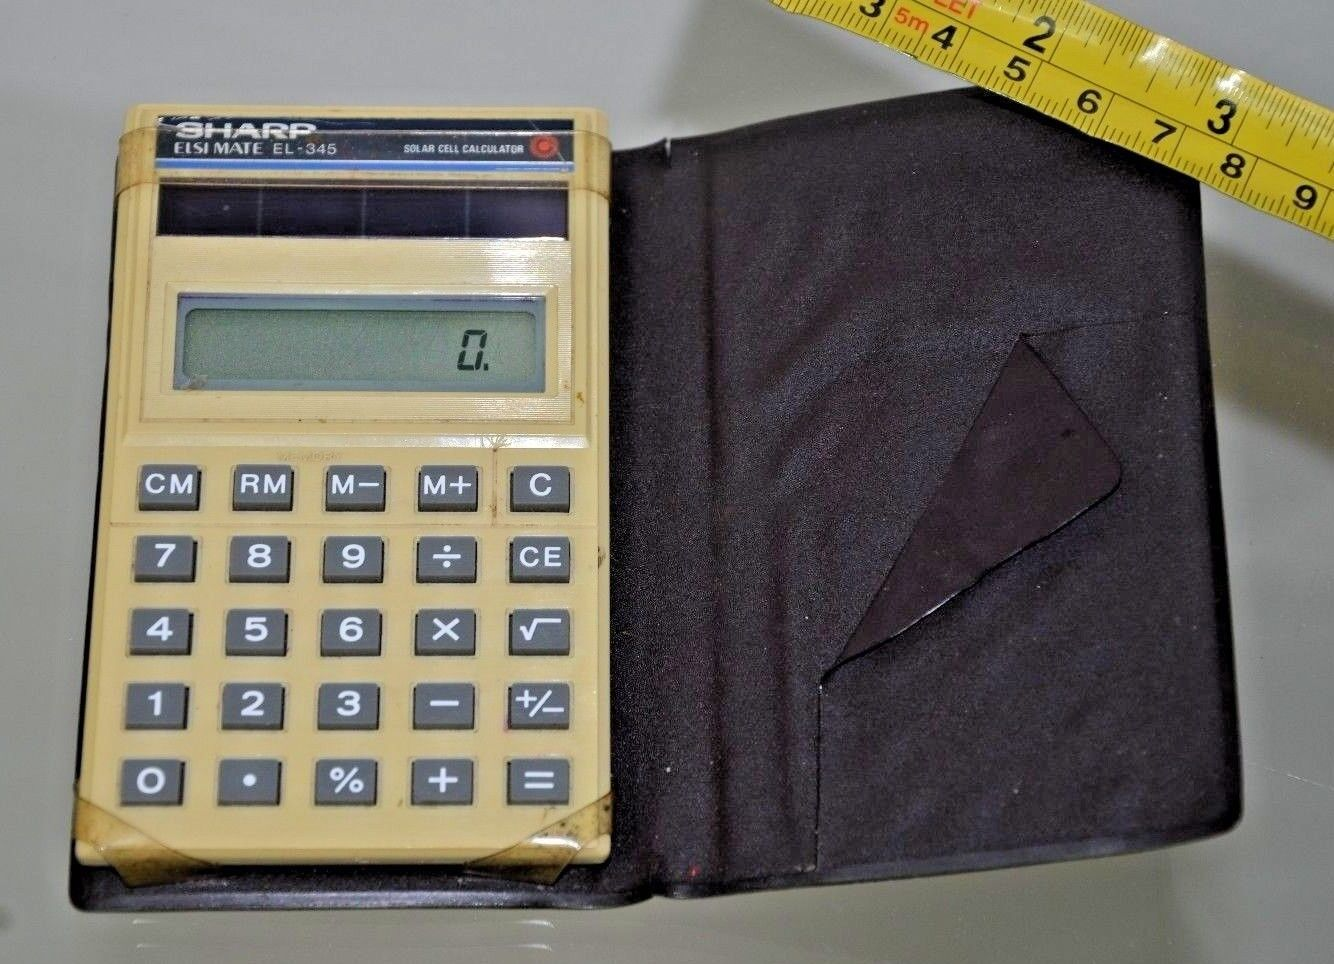 Sharp EL-345 Handheld Electronic Calculator, 1985, solar-powered